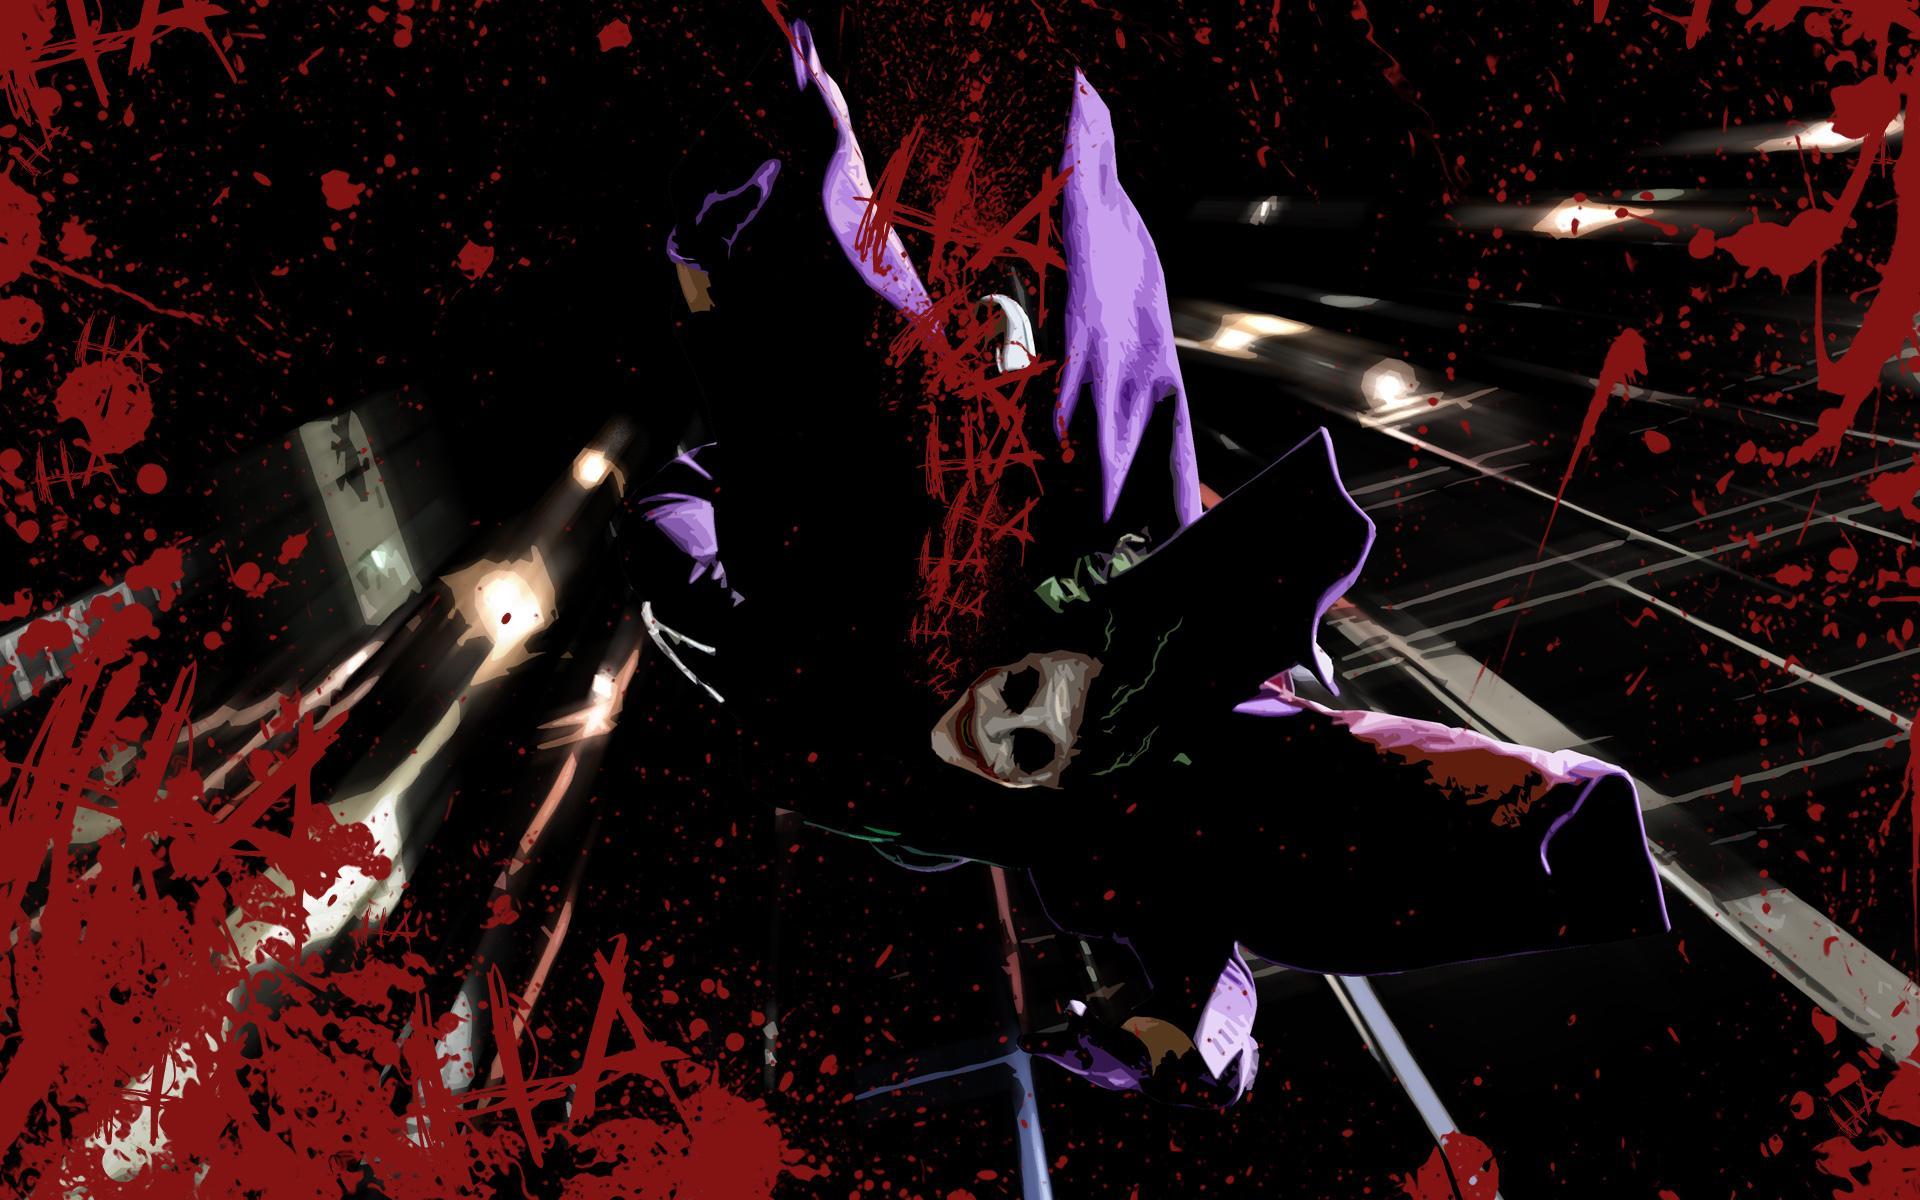 Animated Water Falling Wallpapers Hd Falling Joker In The Dark Knight Wallpaper Download